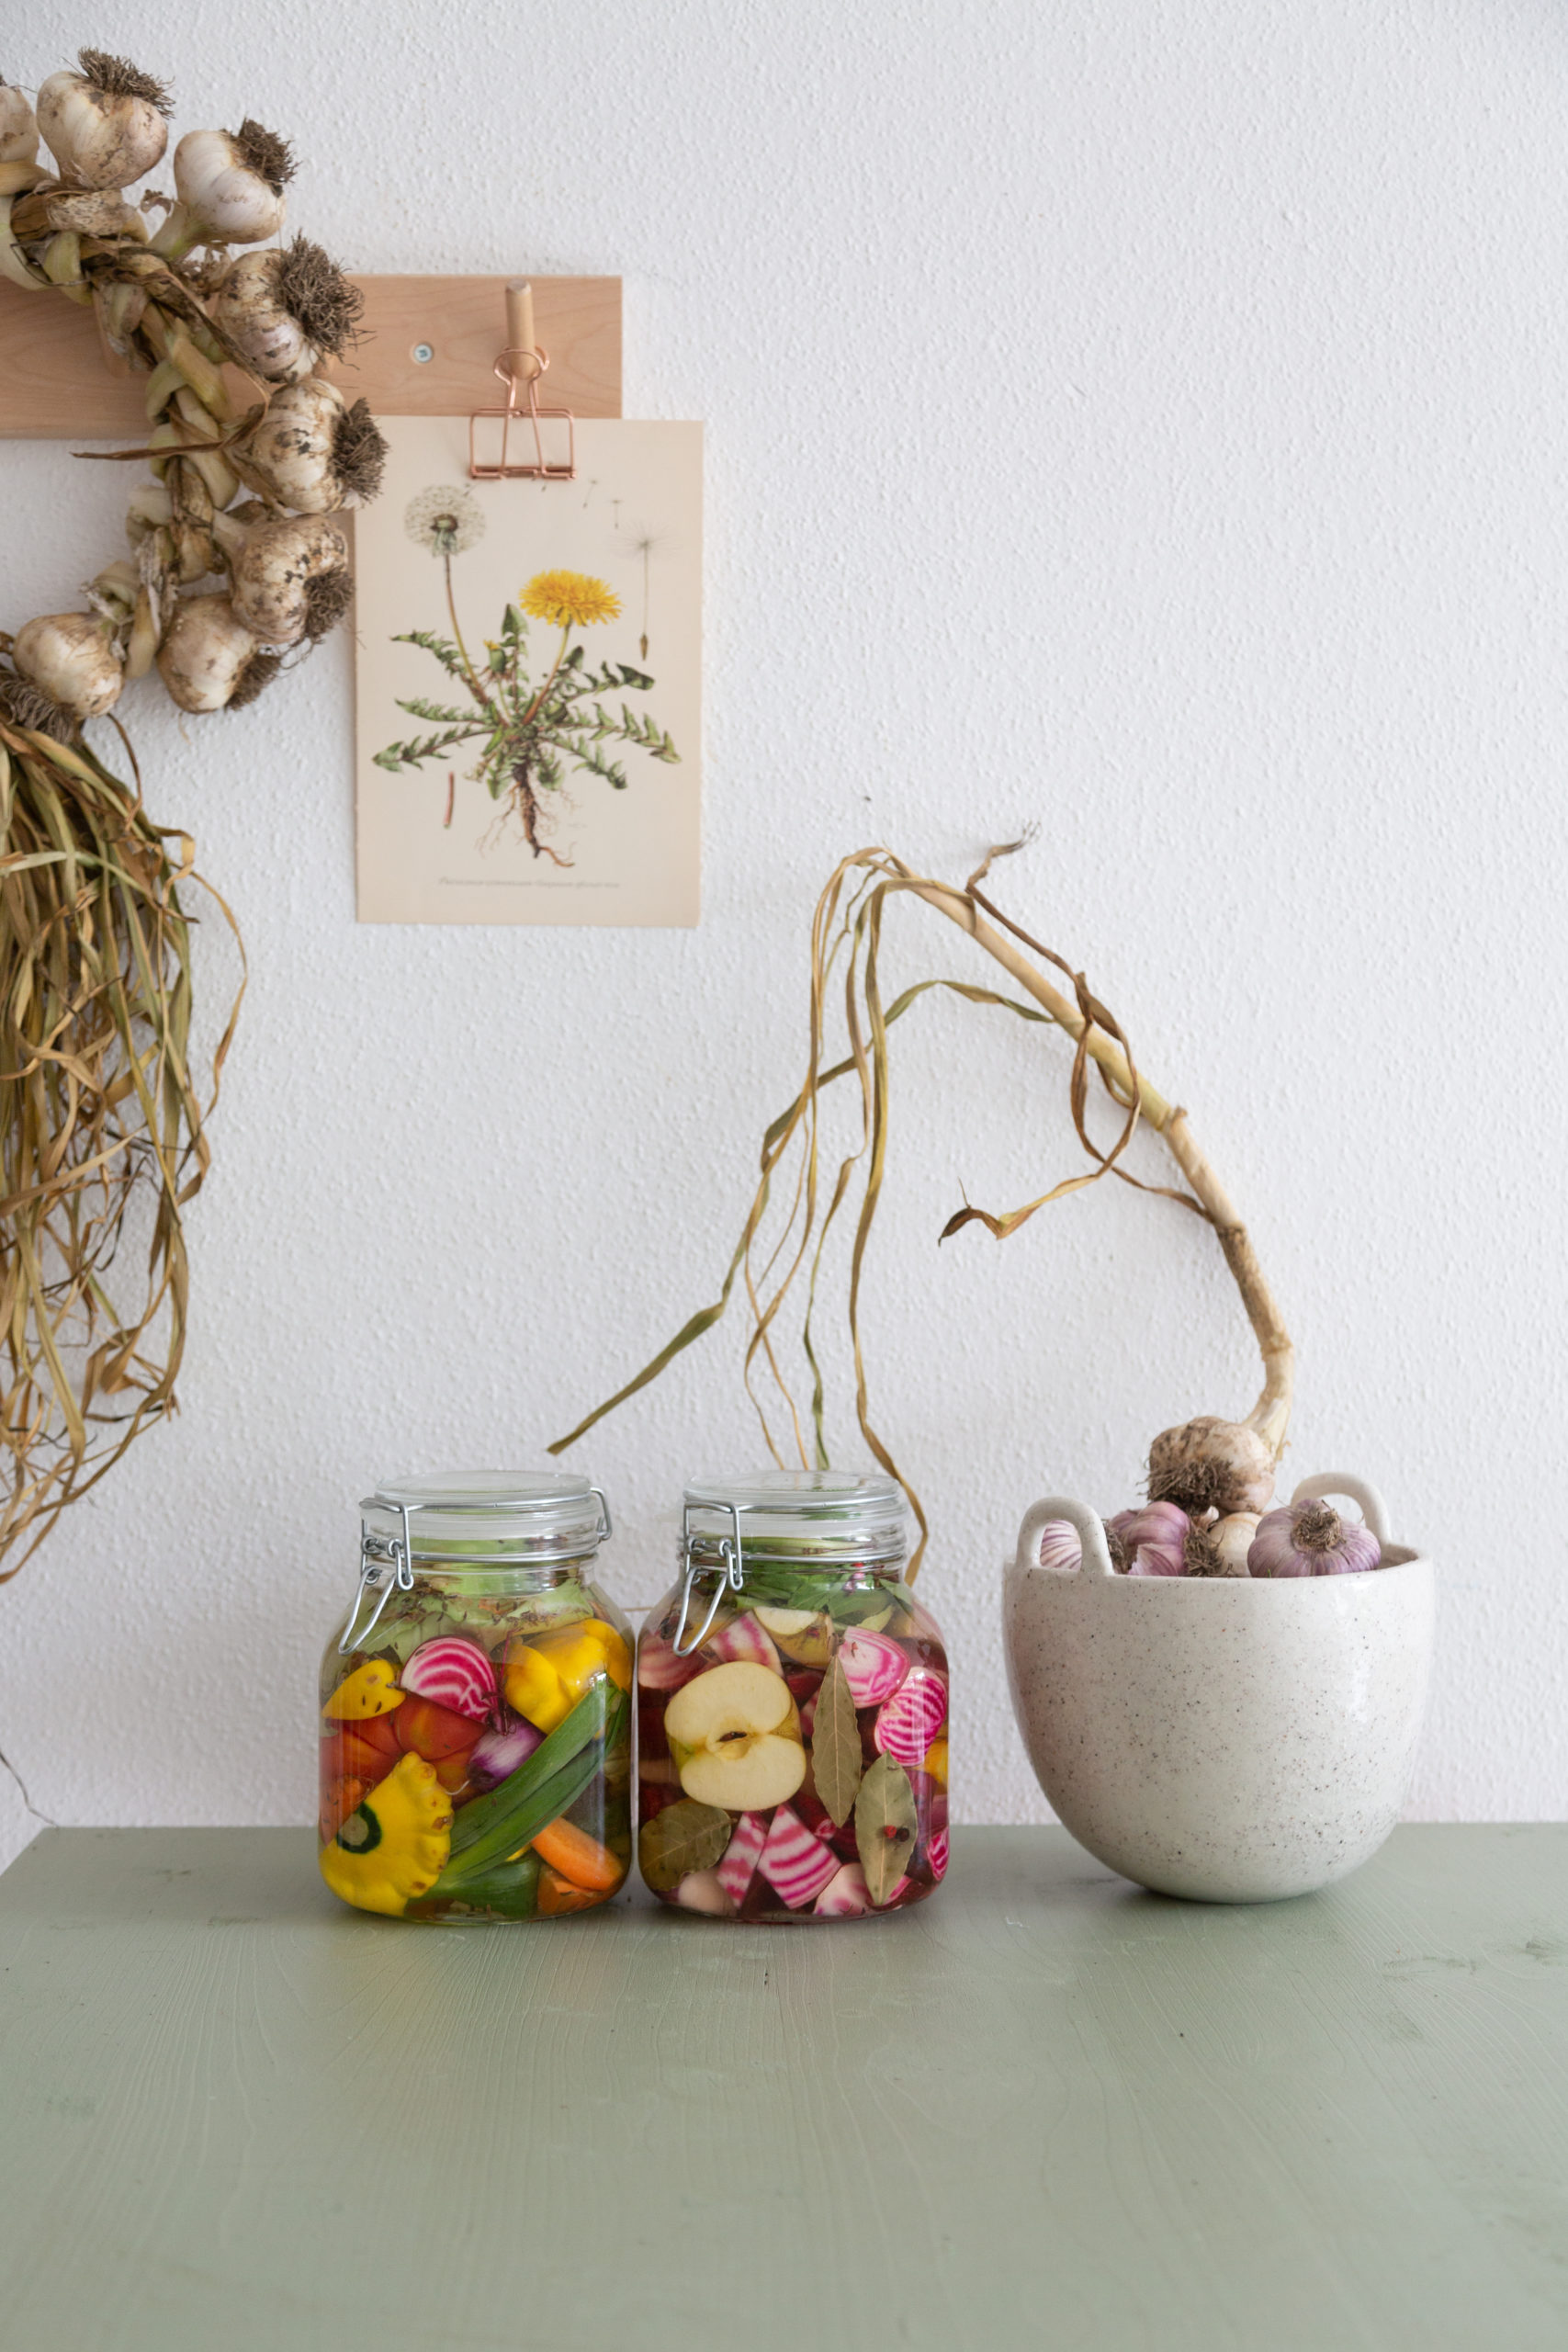 Fermentieren lernen - Online Kurs über Wilde Fermente: buntes Gemüse